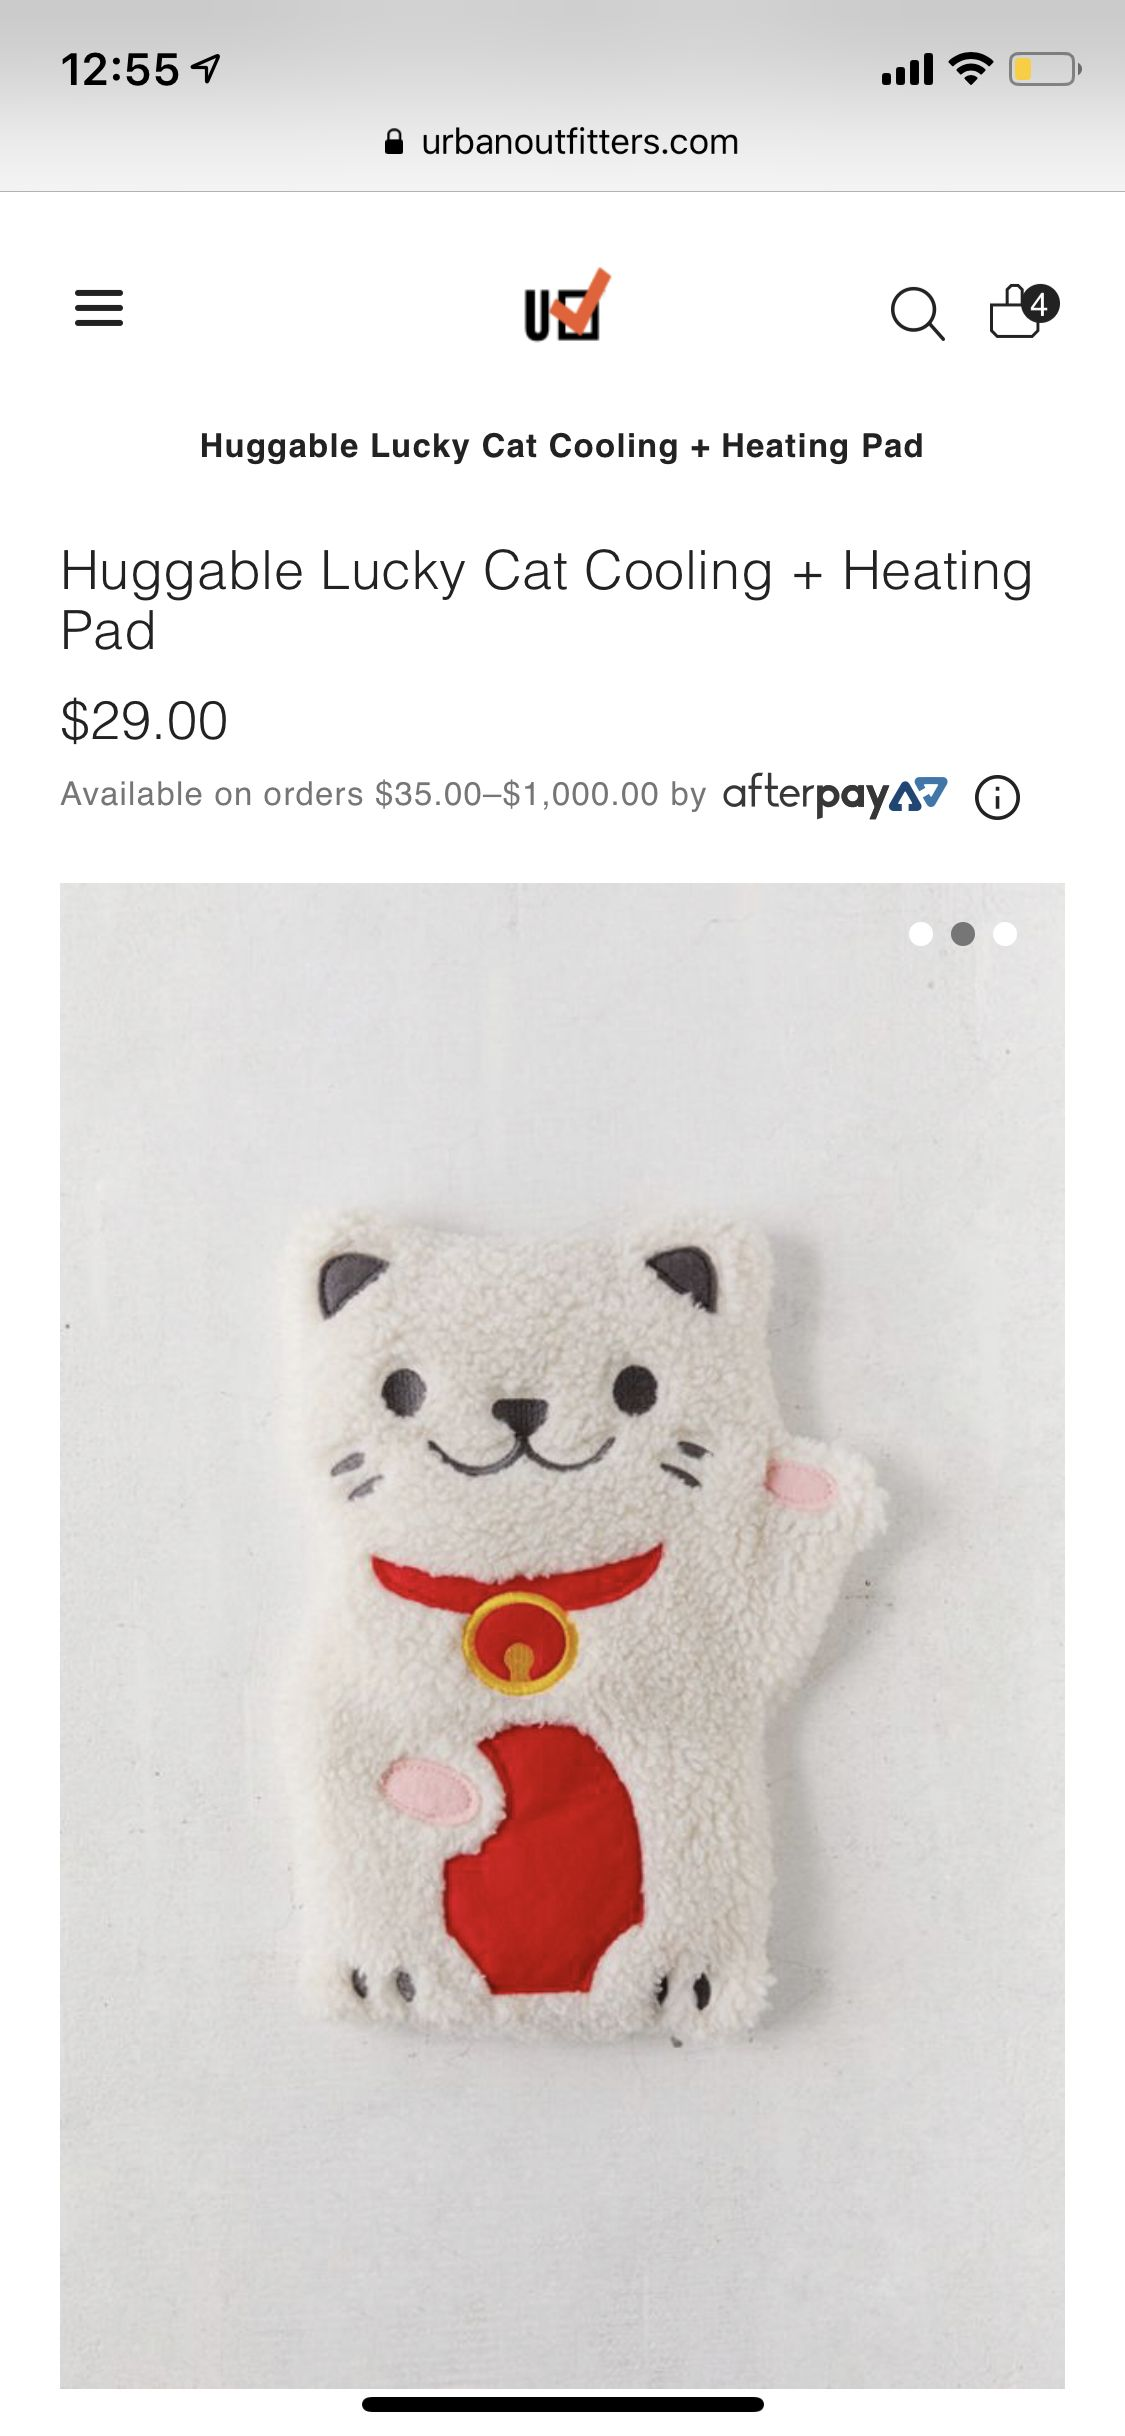 Pin By Mandy Krueger On Wish List Lucky Cat Huggable Heating